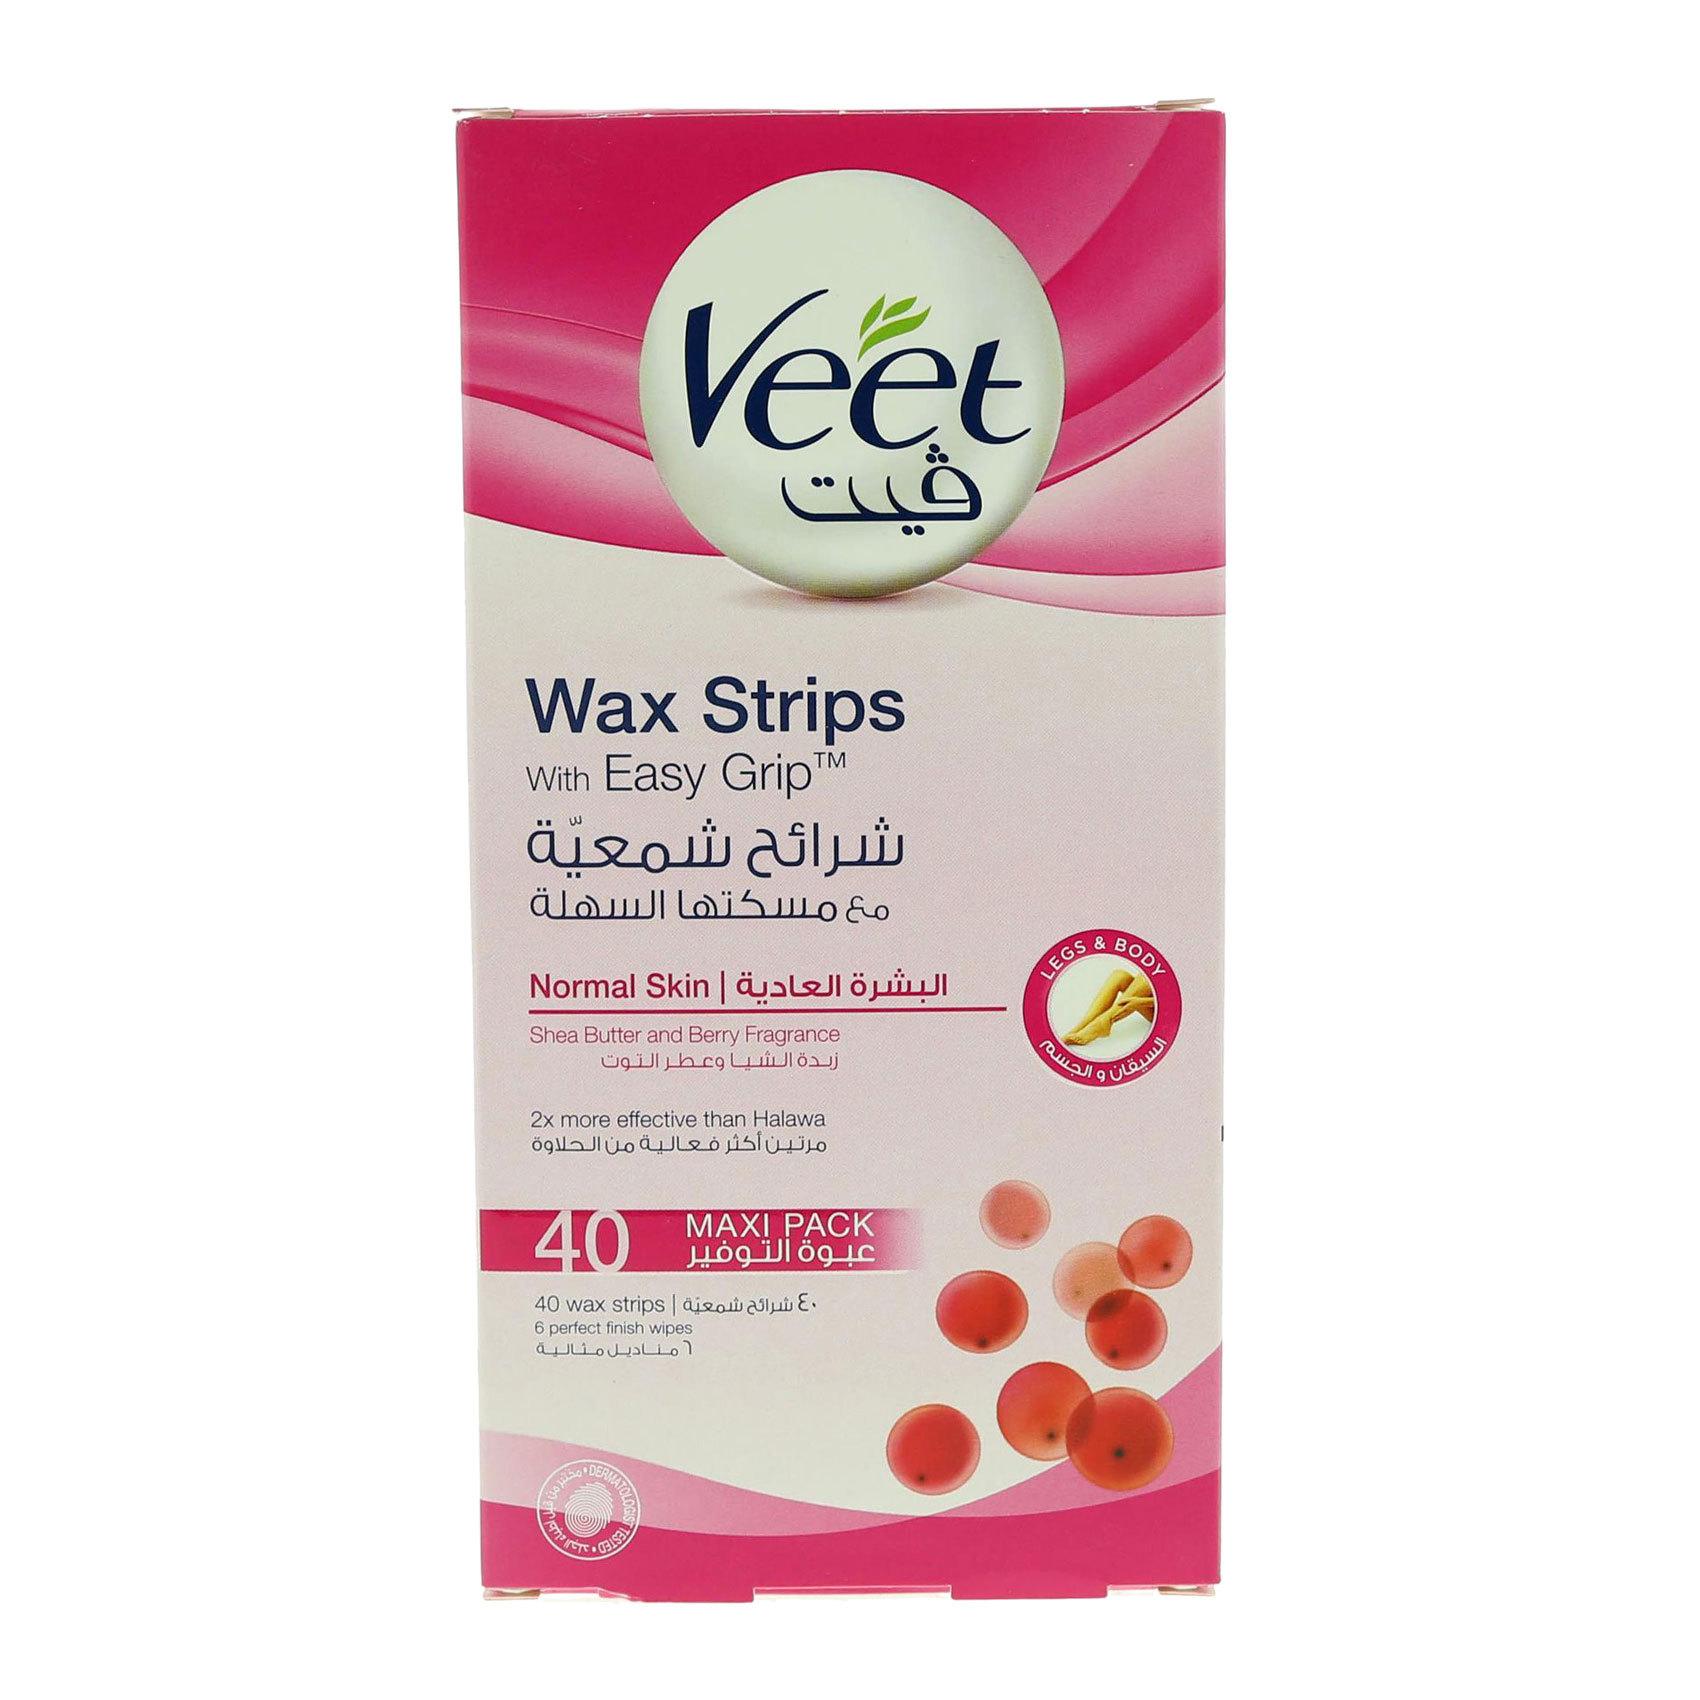 VEET HAIR RMV WAX STRIPS X40